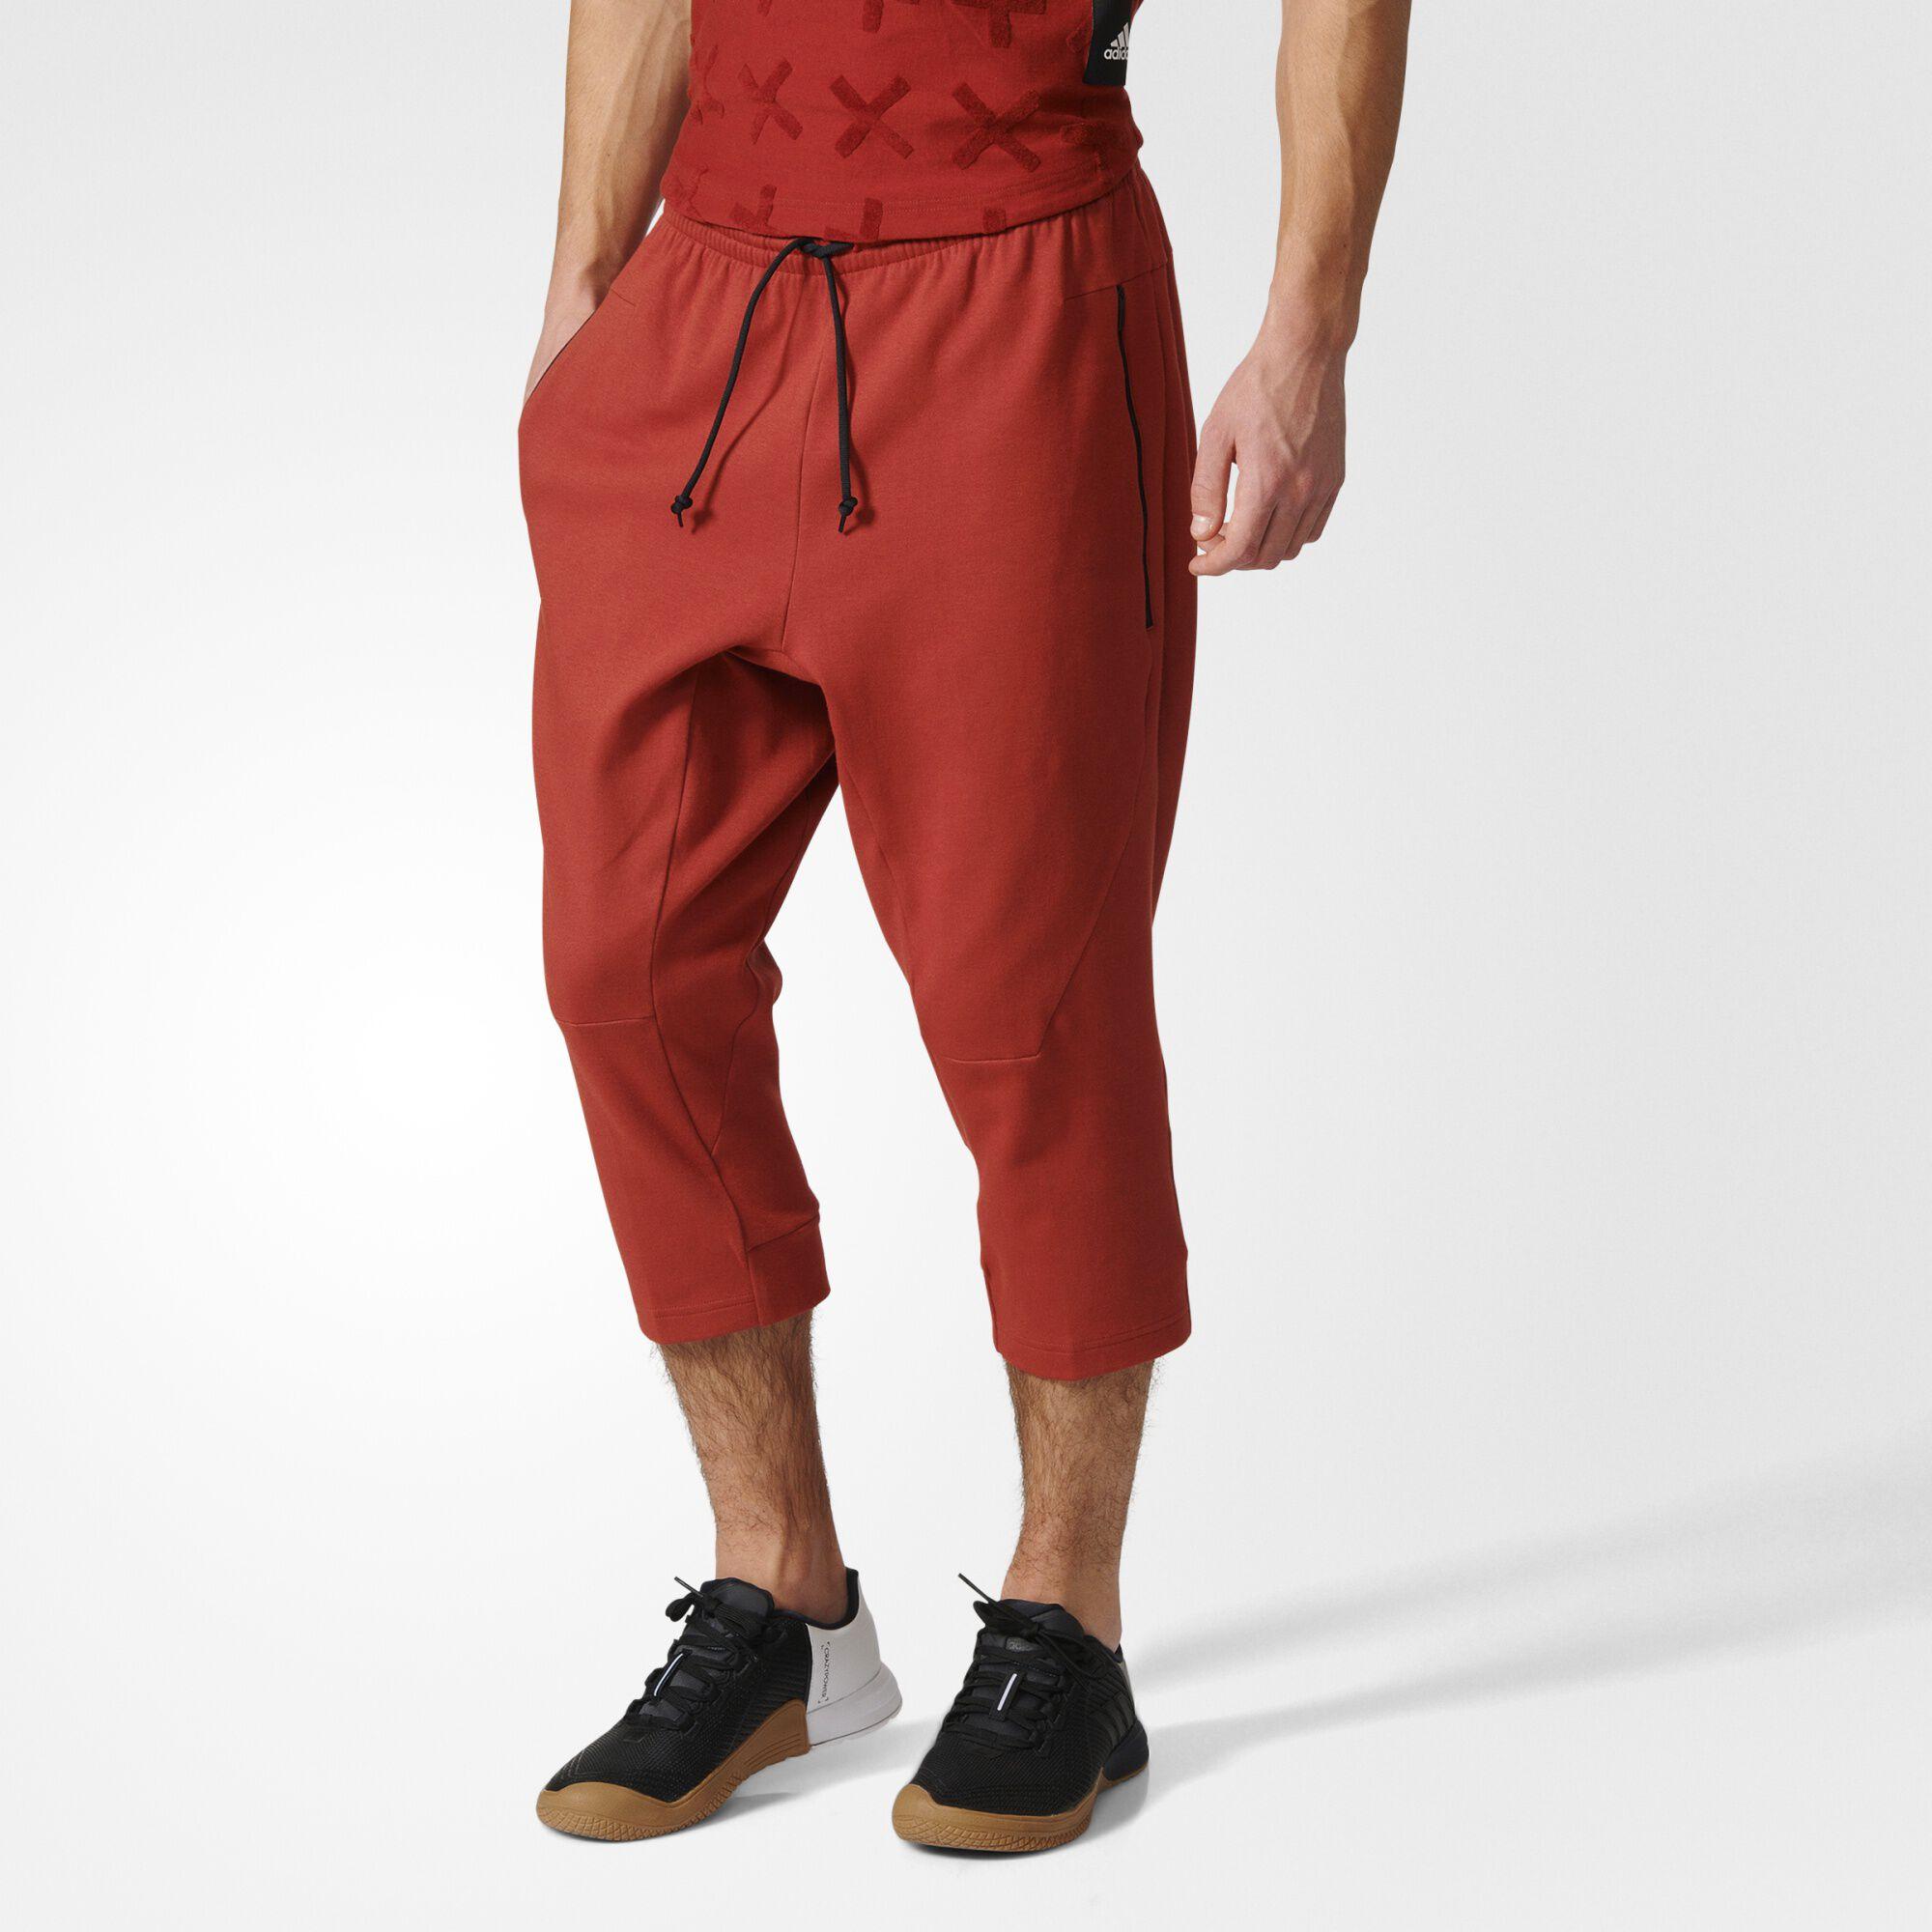 adidas training pants cheap,white adidas f50 > OFF53% Free